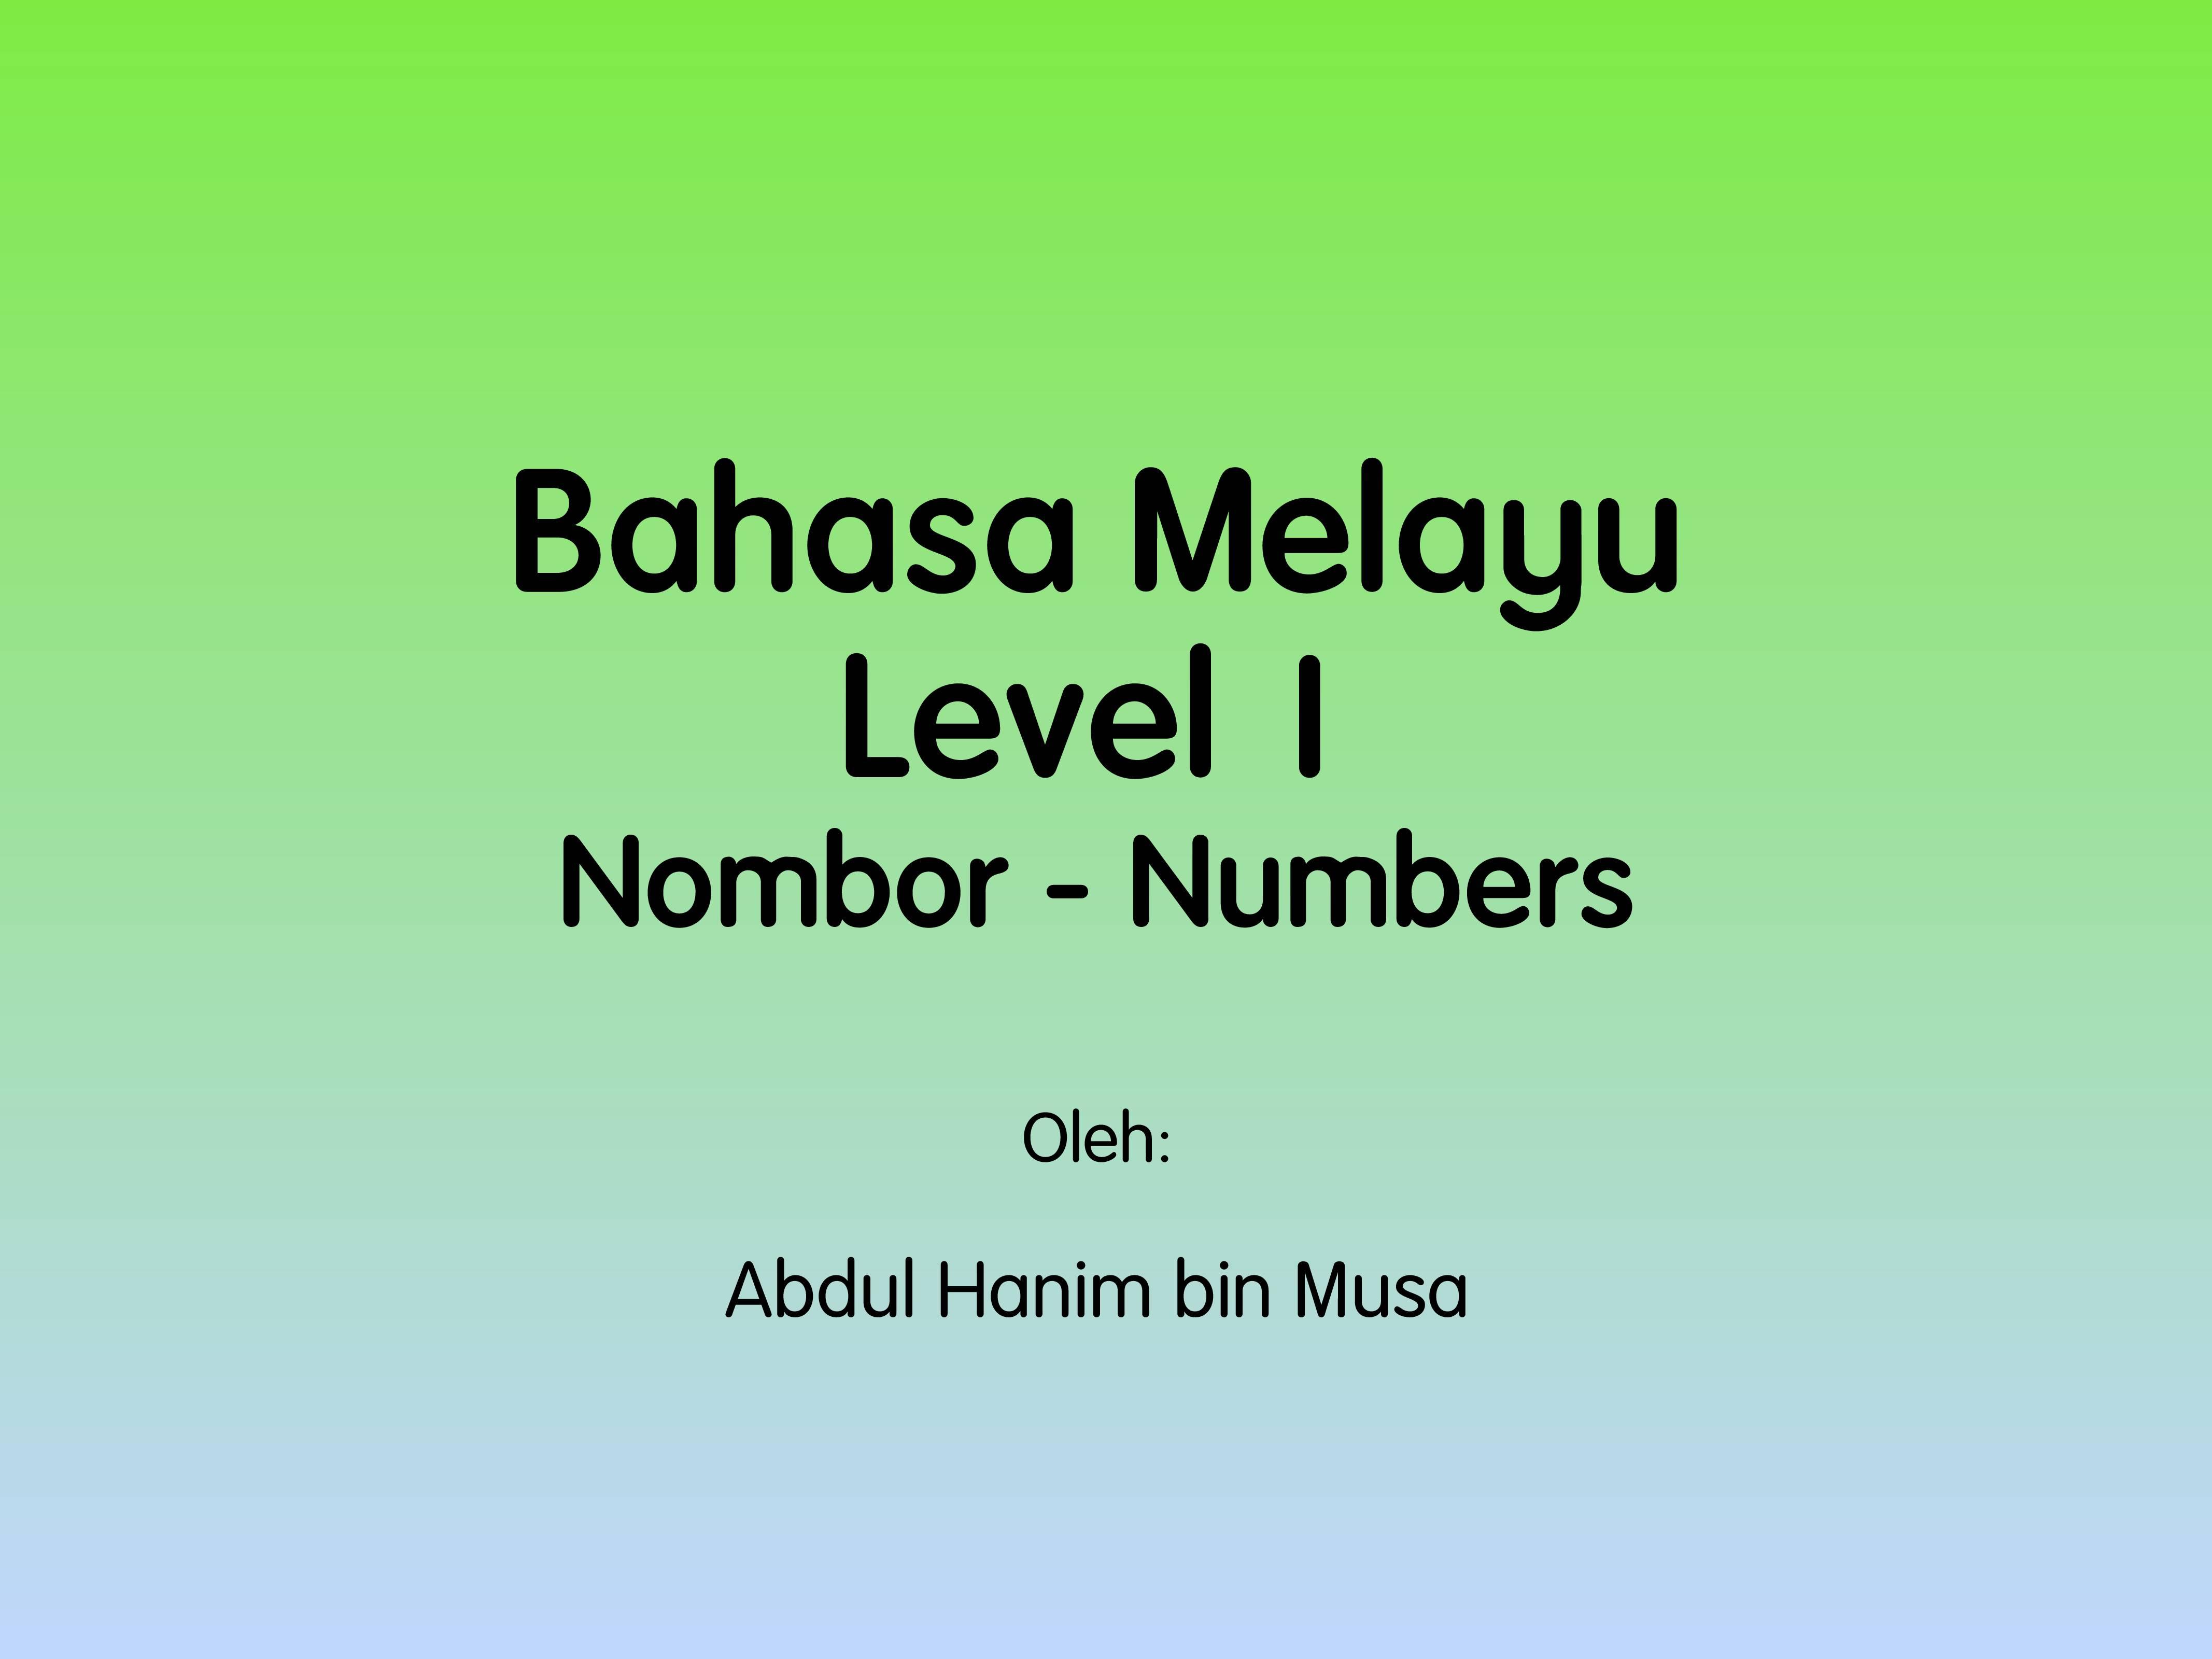 Numbers - Nombor